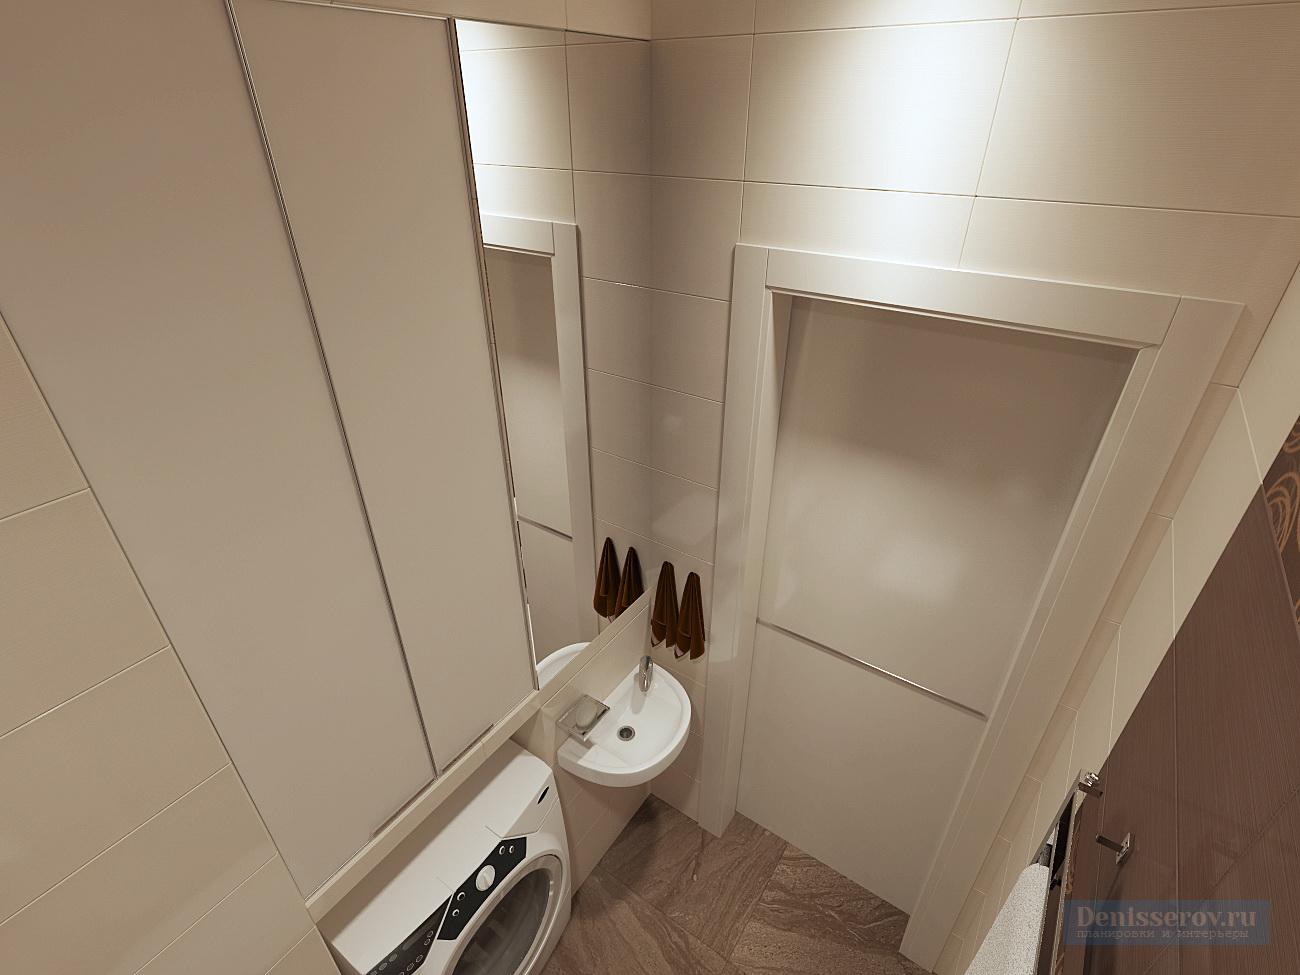 Dizajn-tualet-2-kv-m-v-korichnevom-cvete-2